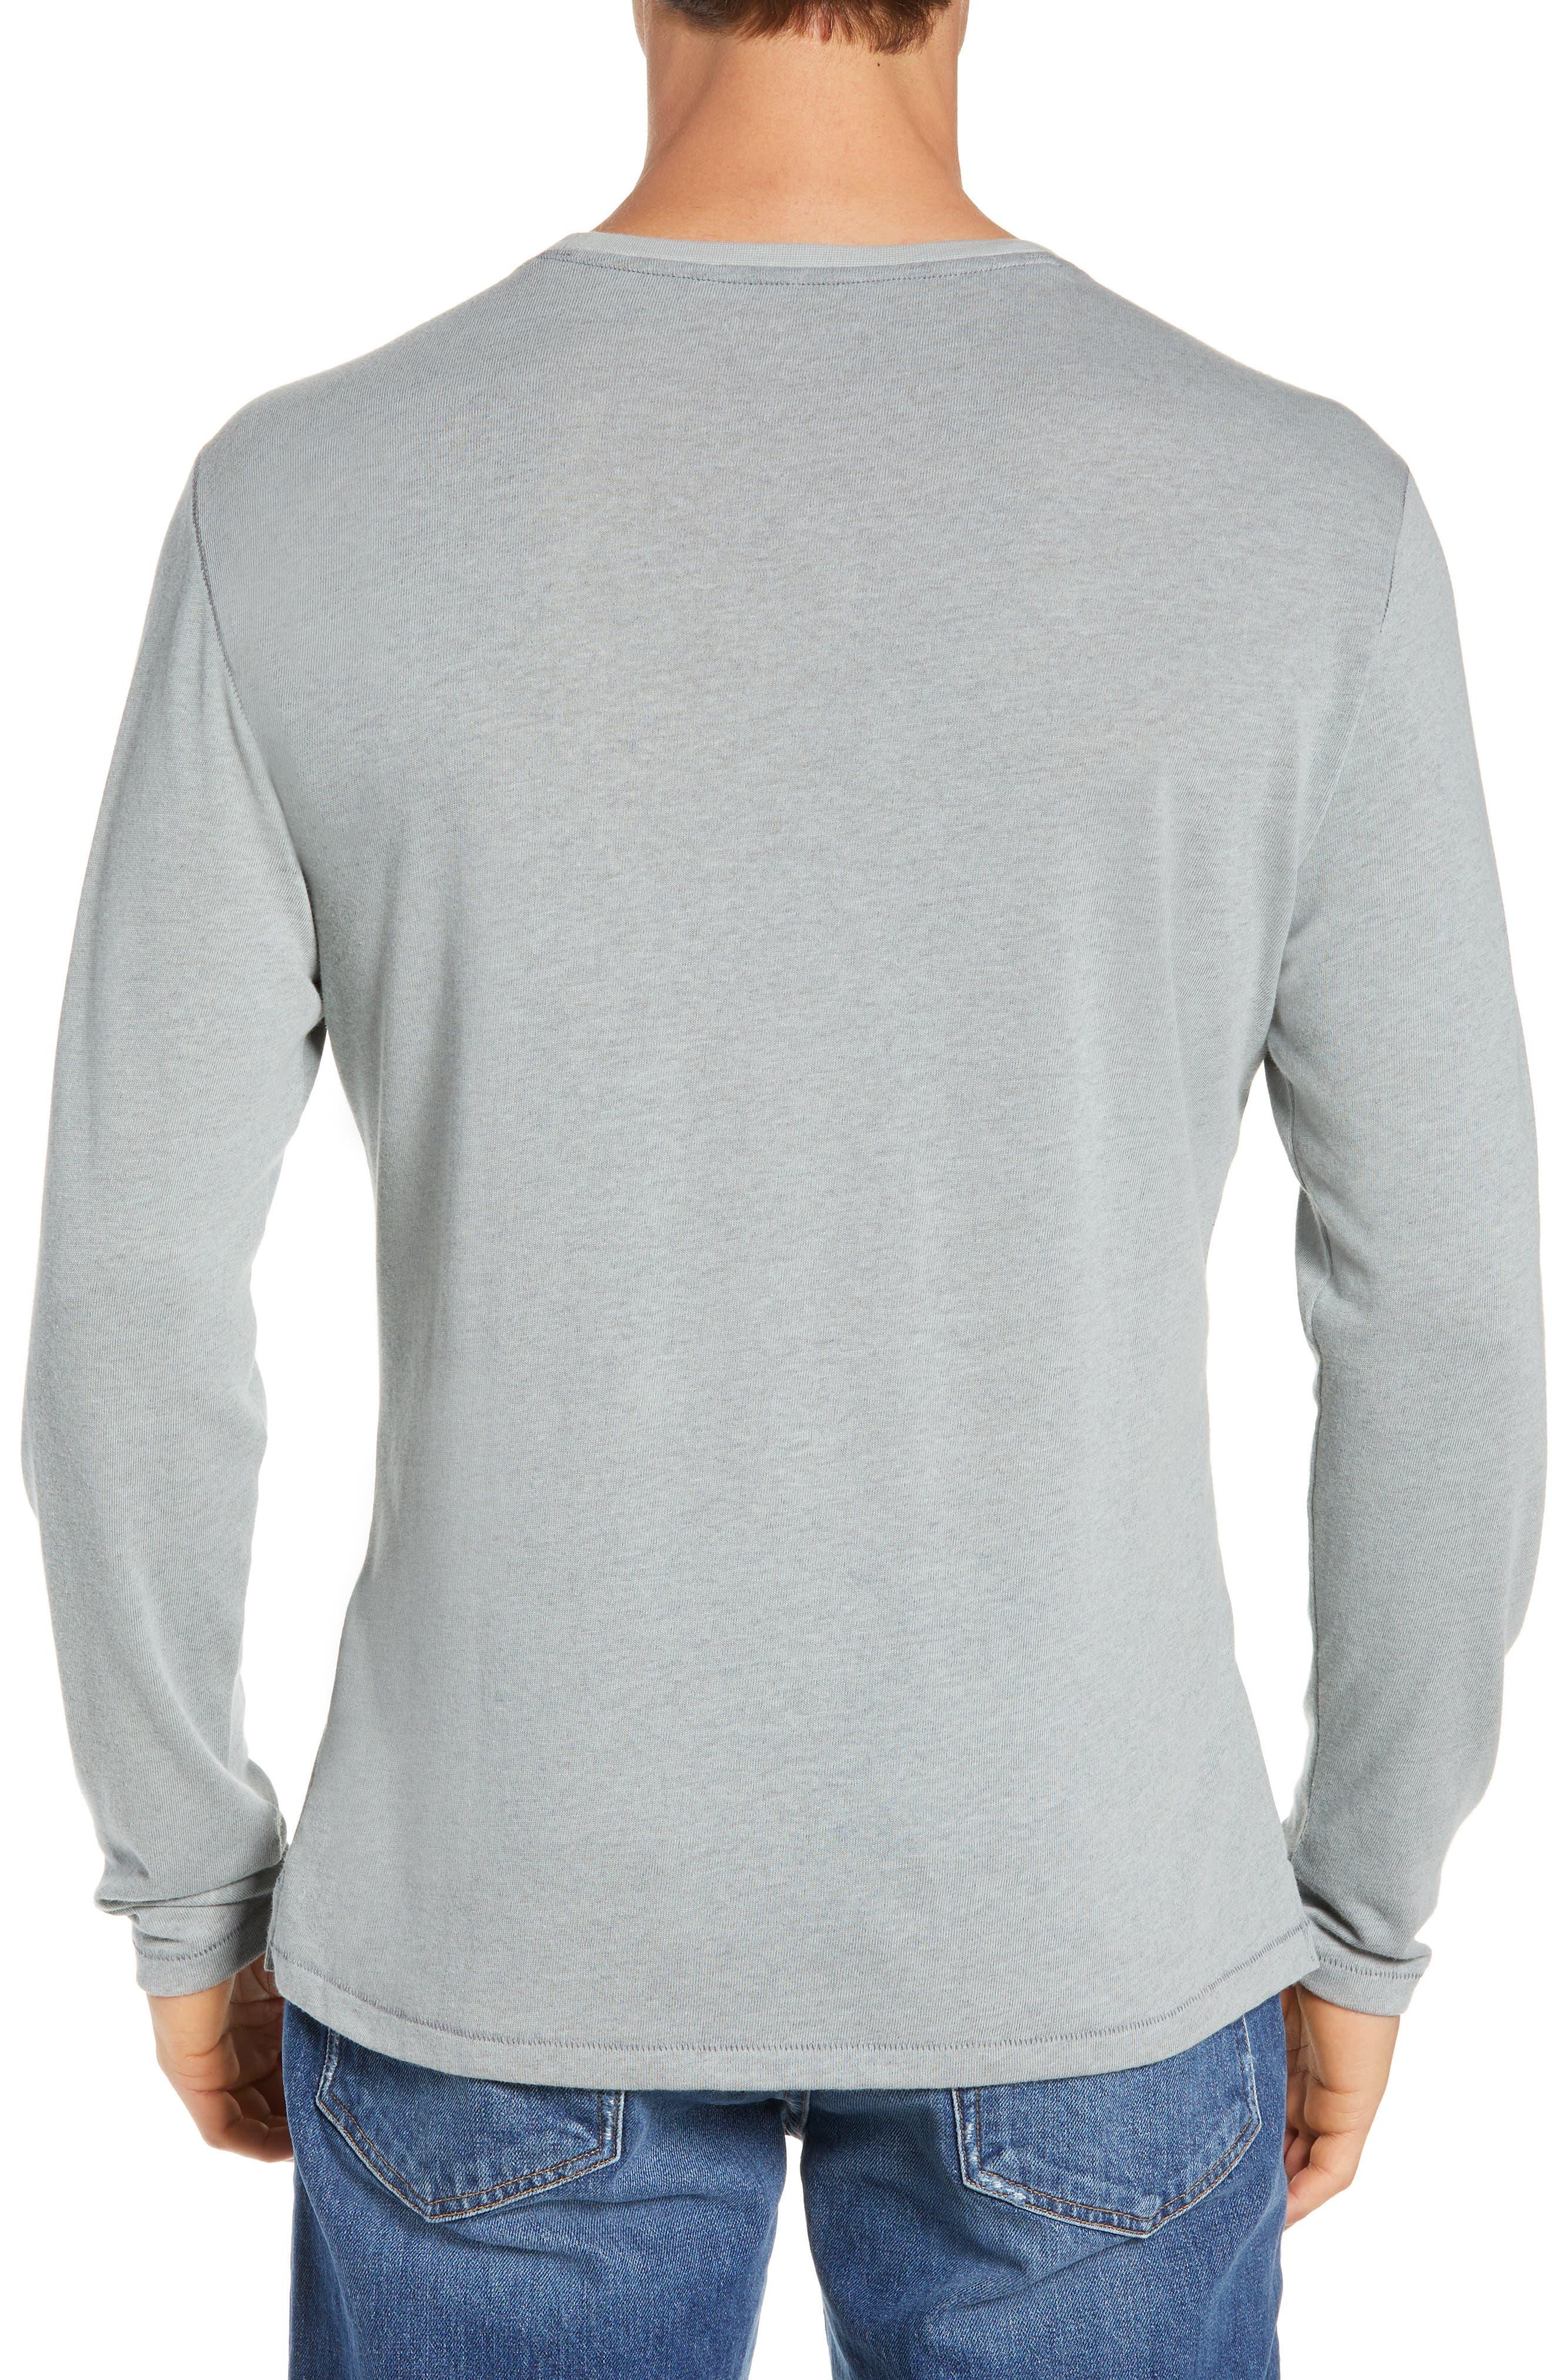 White Rock T-Shirt,                             Alternate thumbnail 2, color,                             LIGHT GREY